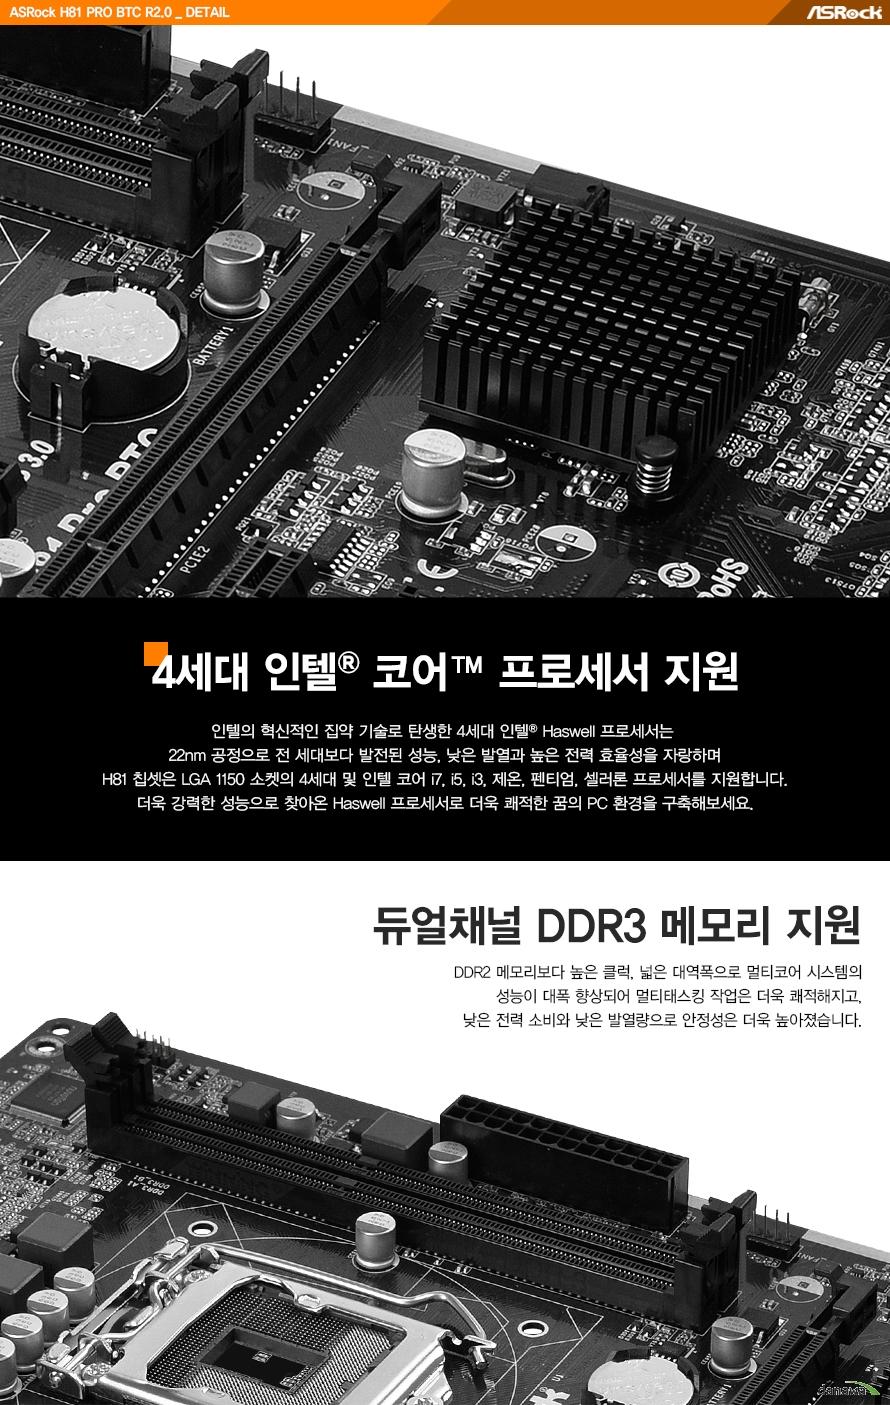 Asrock H81 Pro Btc R20 11street Motherboard 4